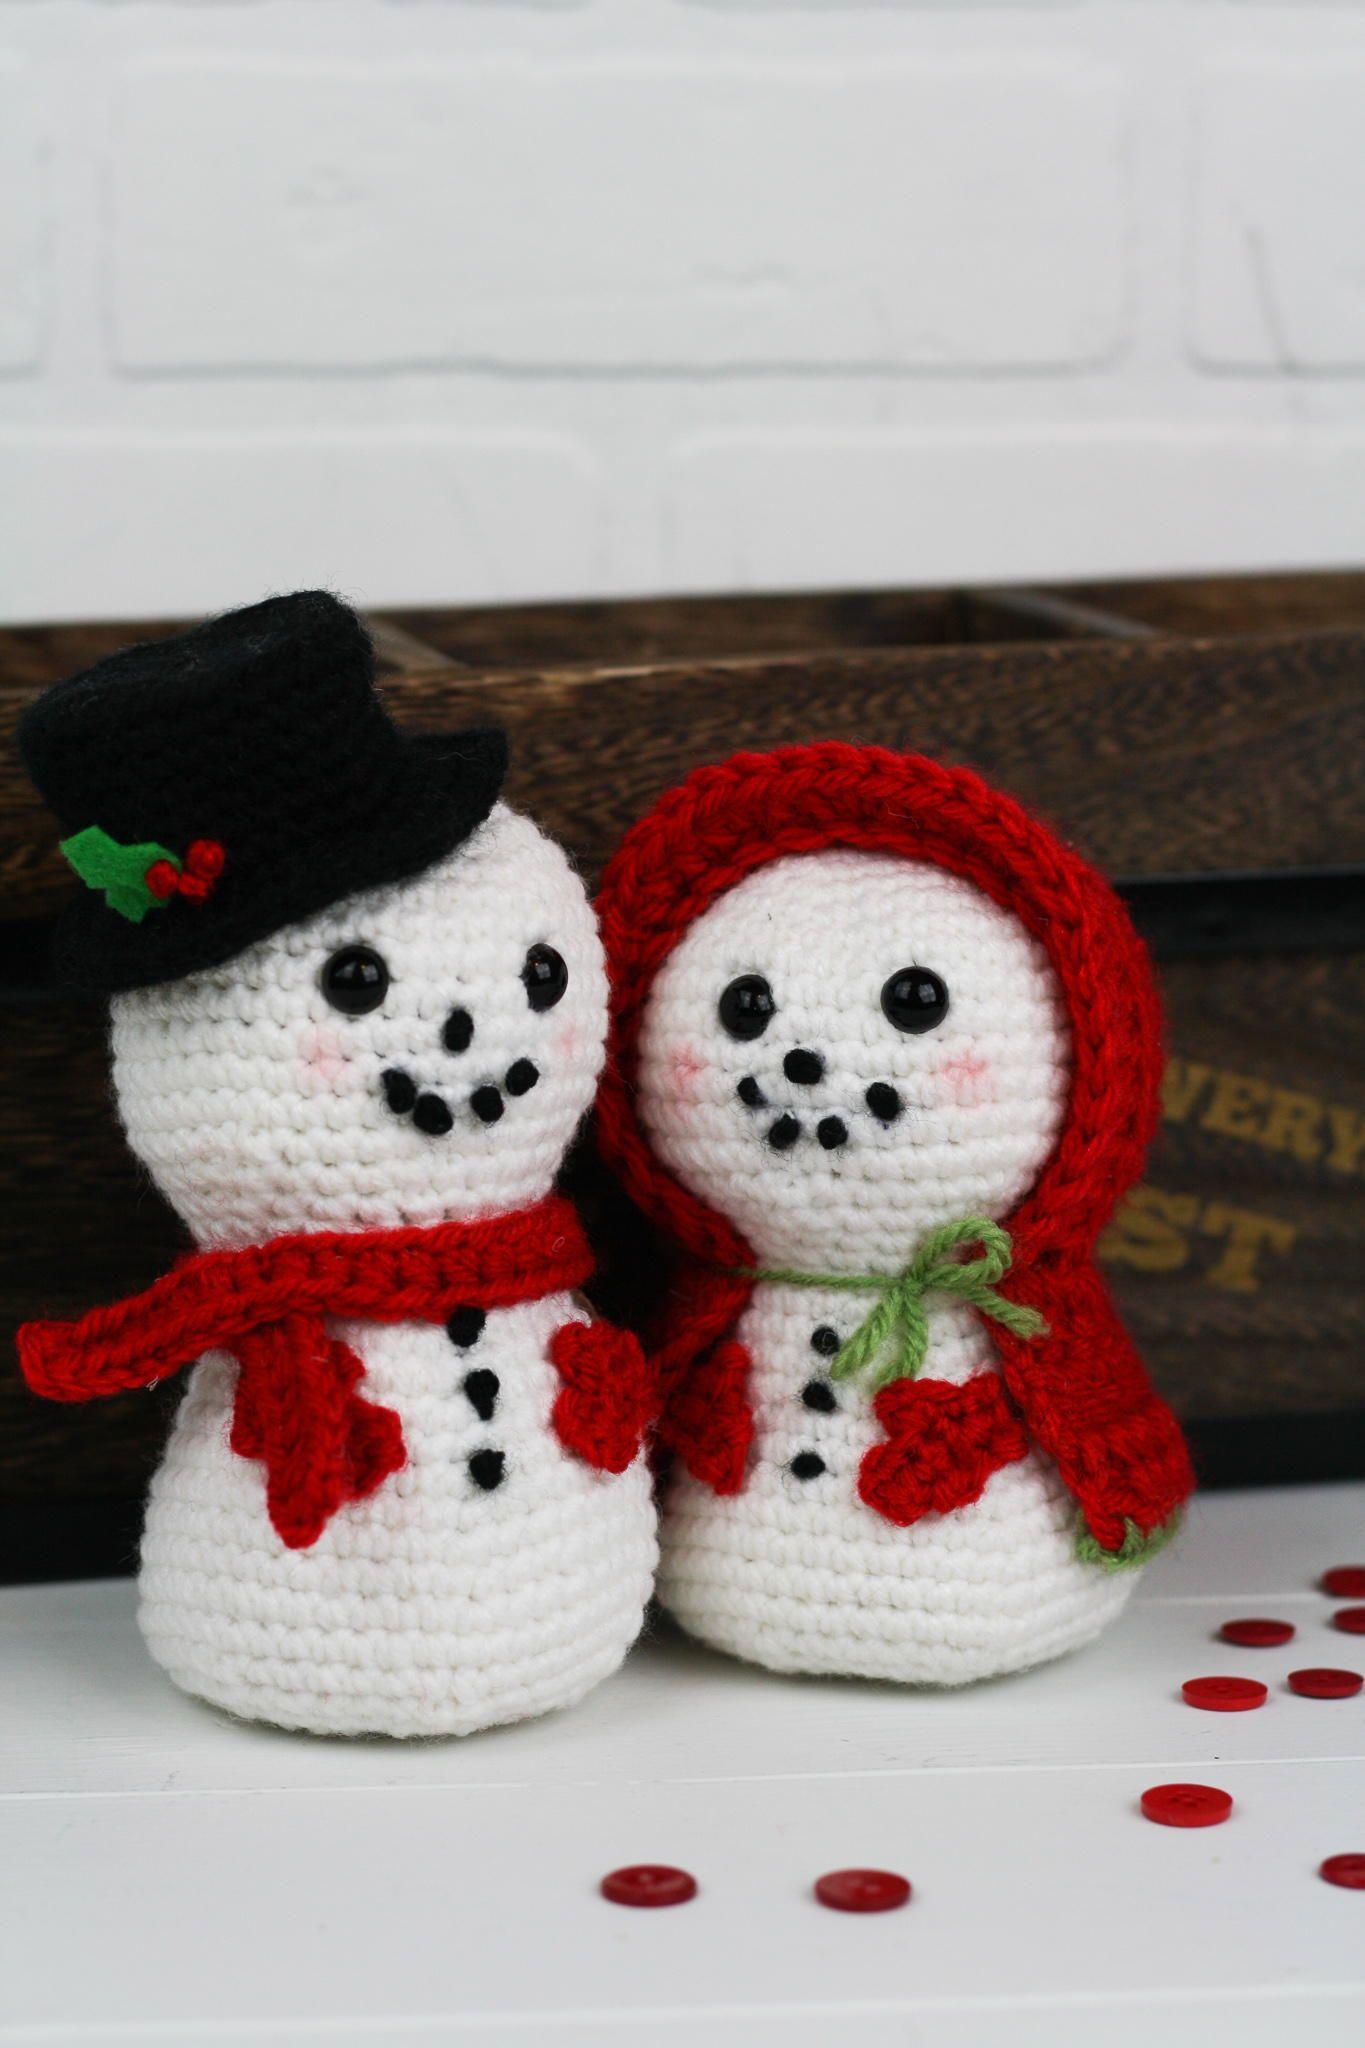 Crochet plush snowman | Crochet christmas decorations, Christmas ... | 2048x1365